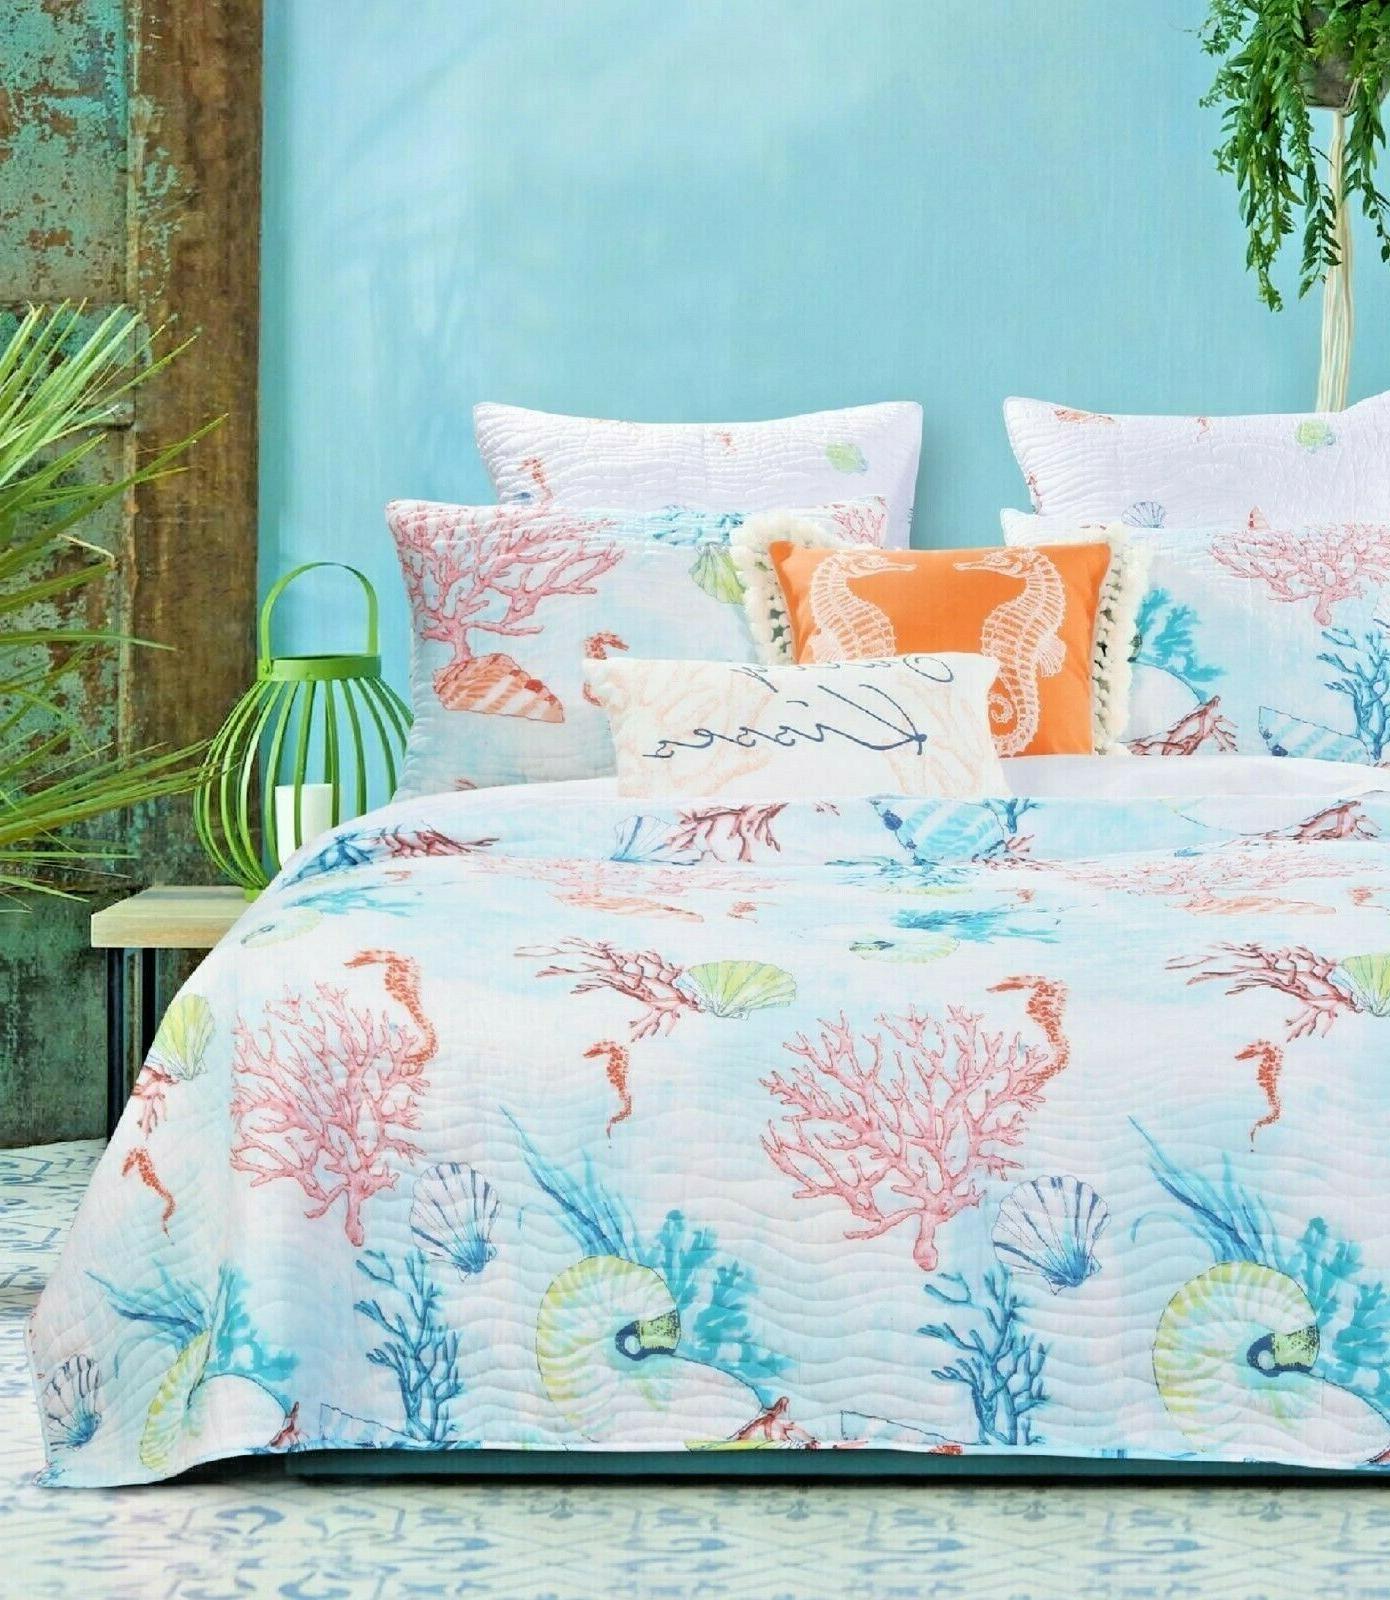 Quilt Set Queen Bedding Comforter Soft Multi Color Bed